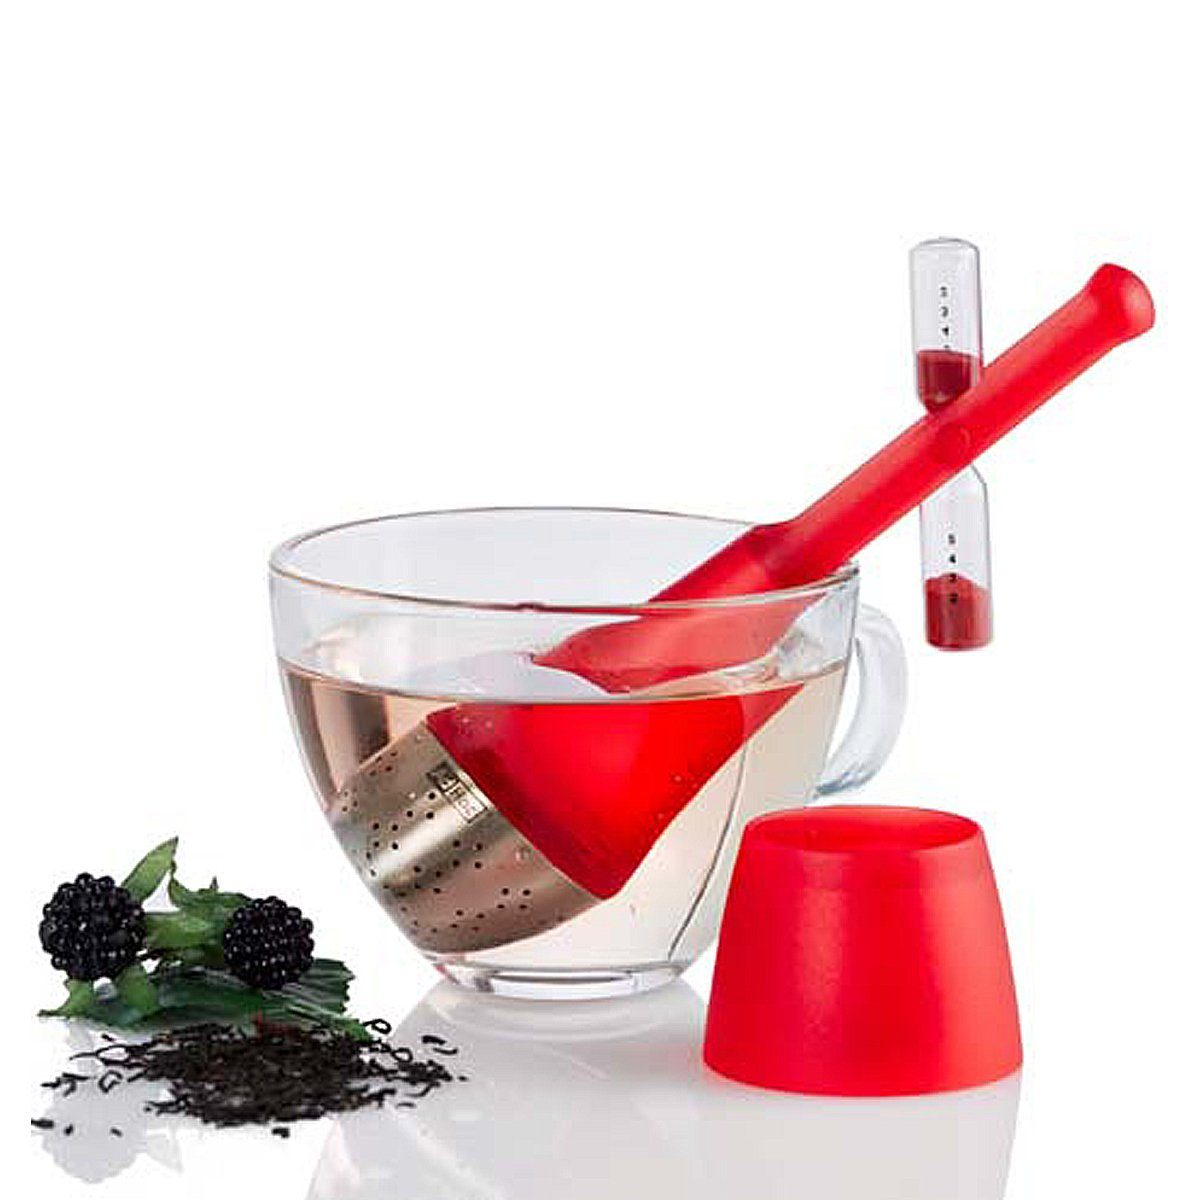 AdHoc AdHoc Teefilter TEA TIME mit drehbarer Sanduhr, rot